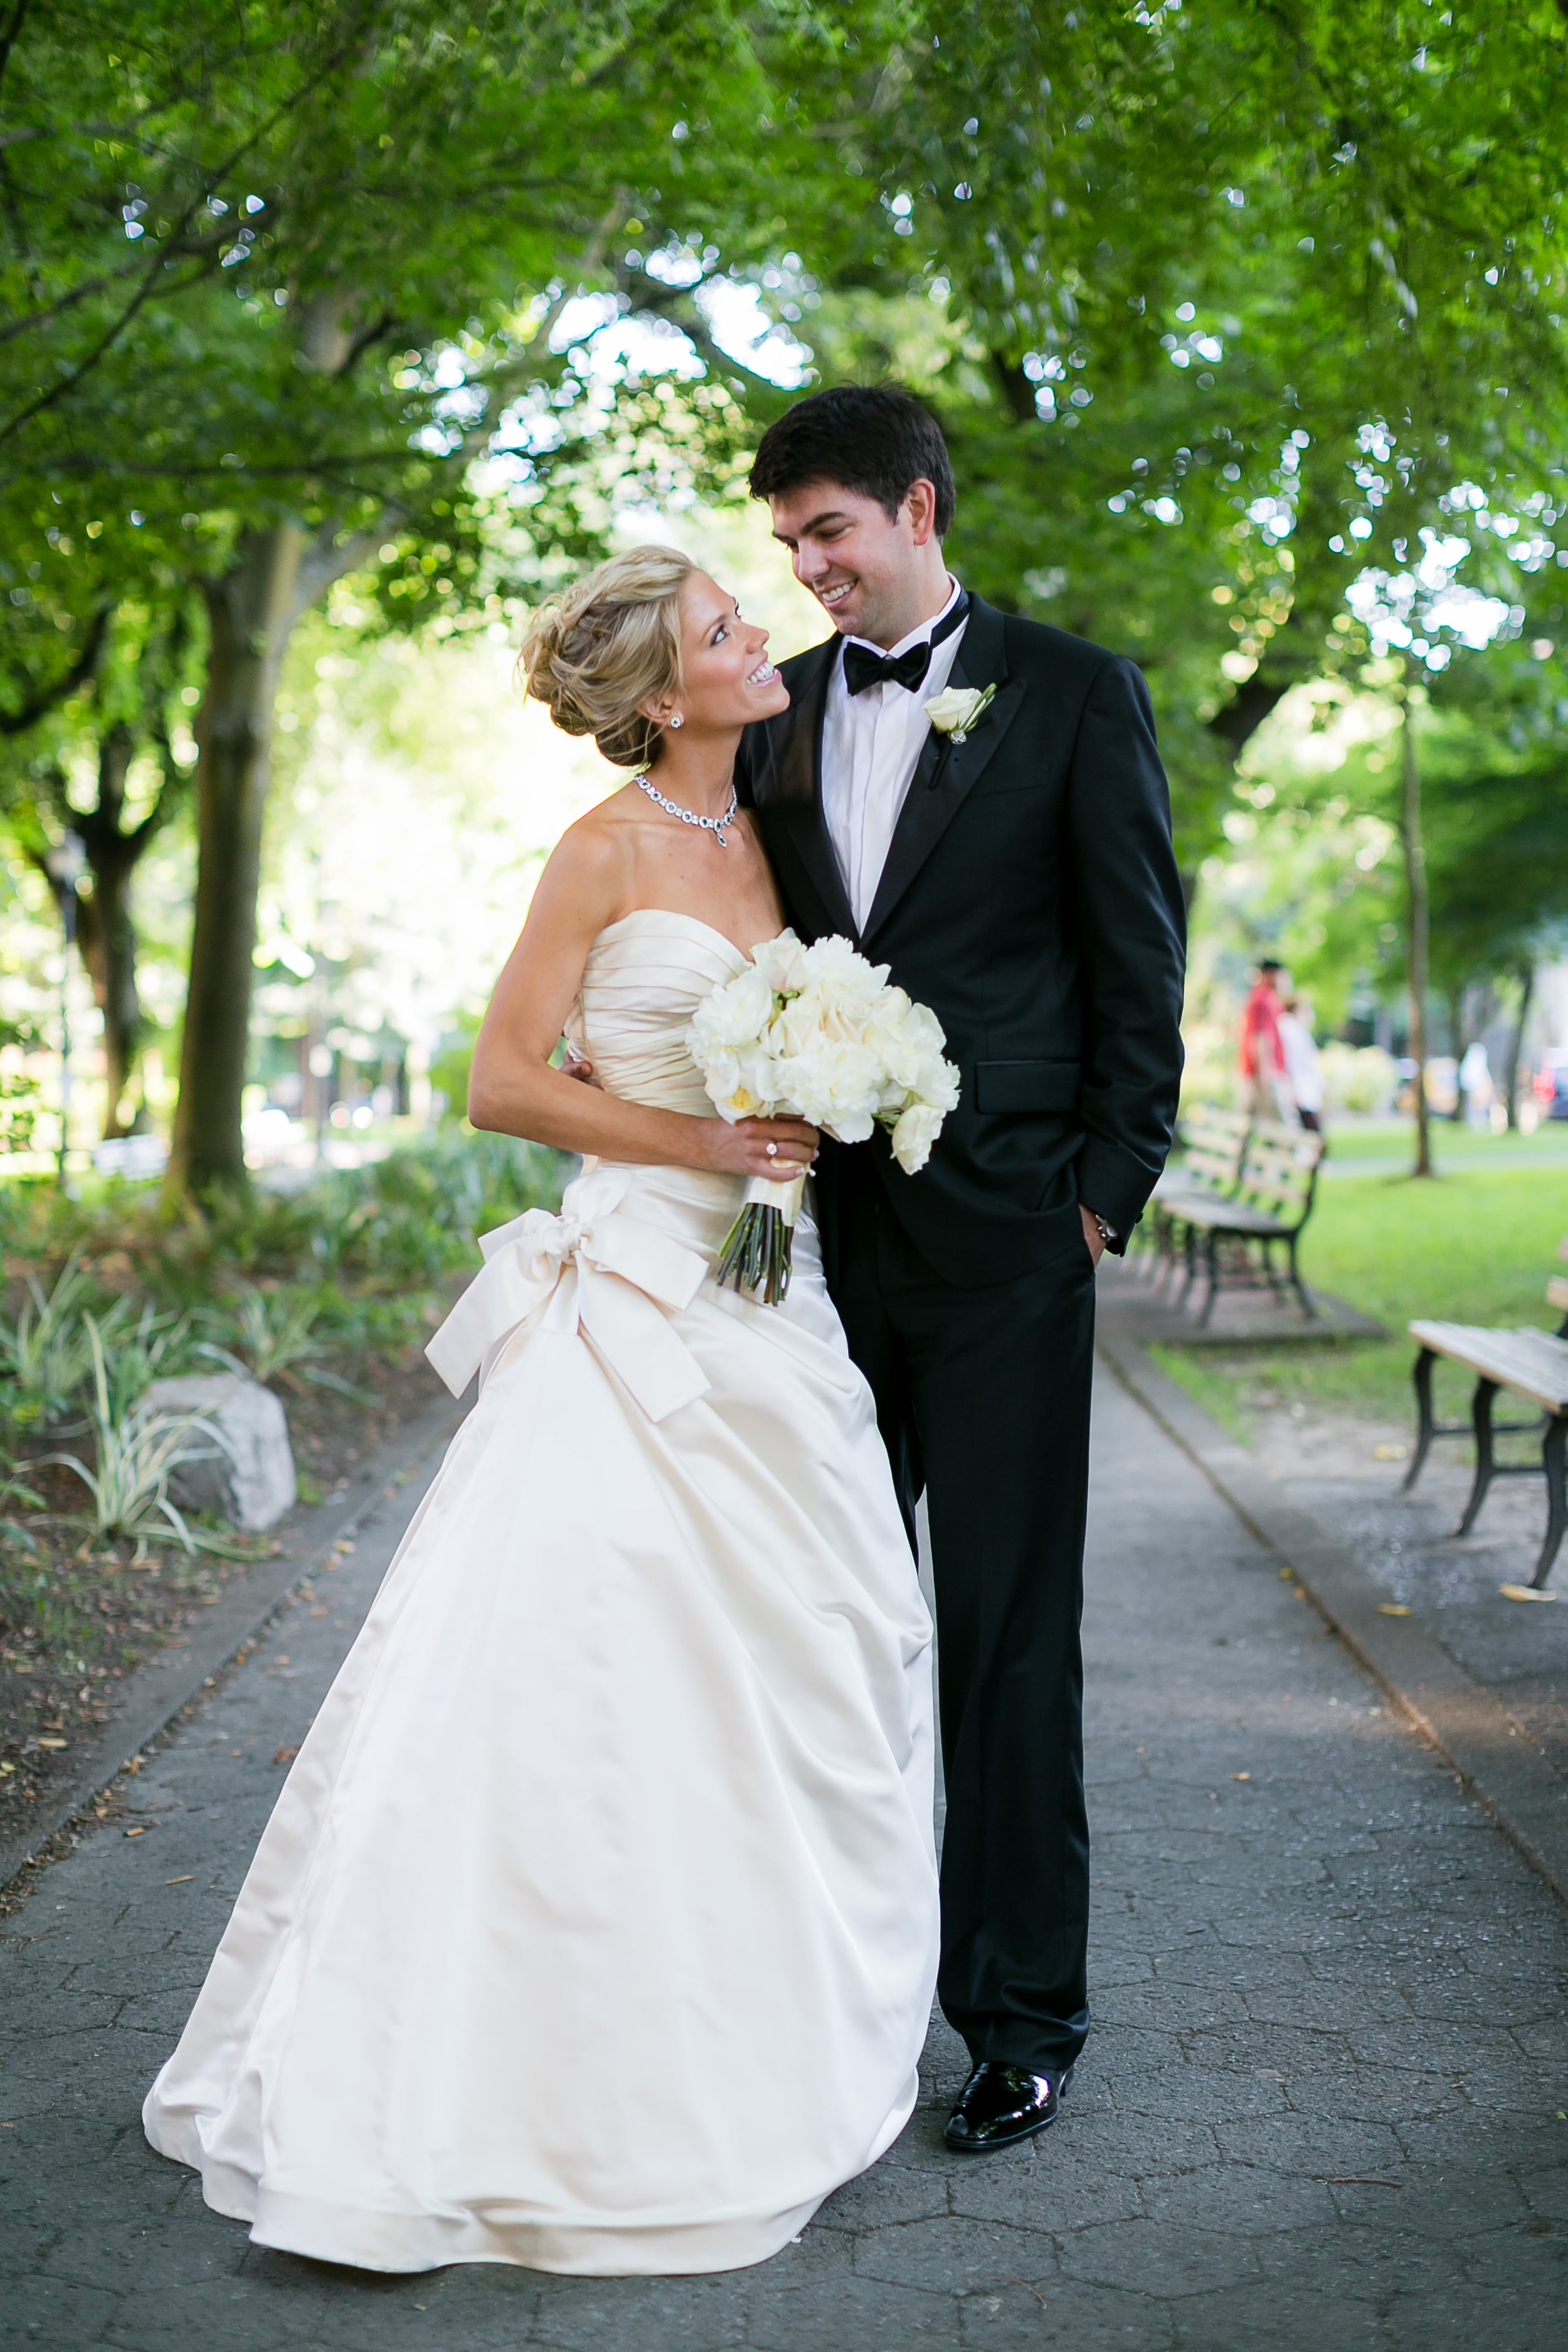 Wedding Pictures (Nora)-80.jpg